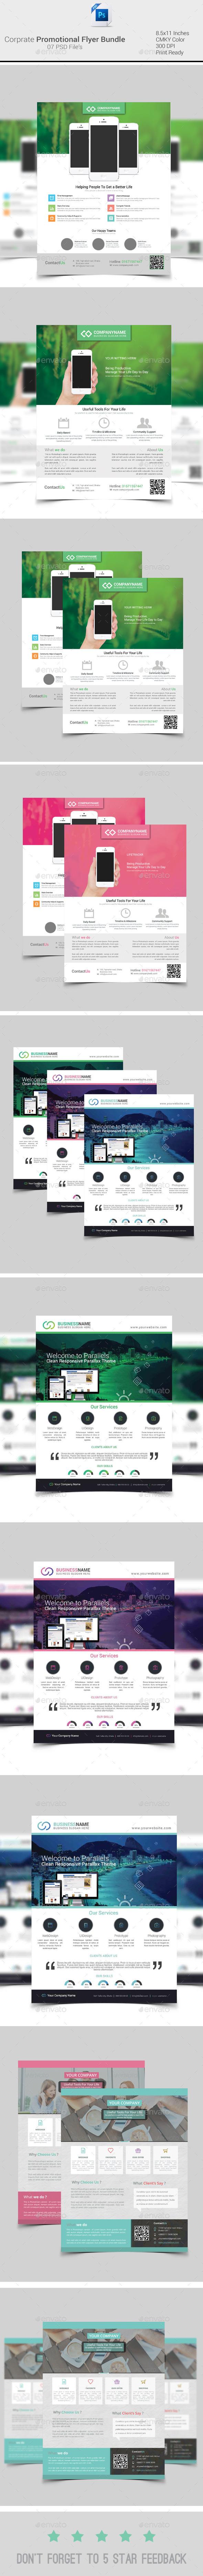 Corporate Promotion  Flyer Bundle - Corporate Flyers